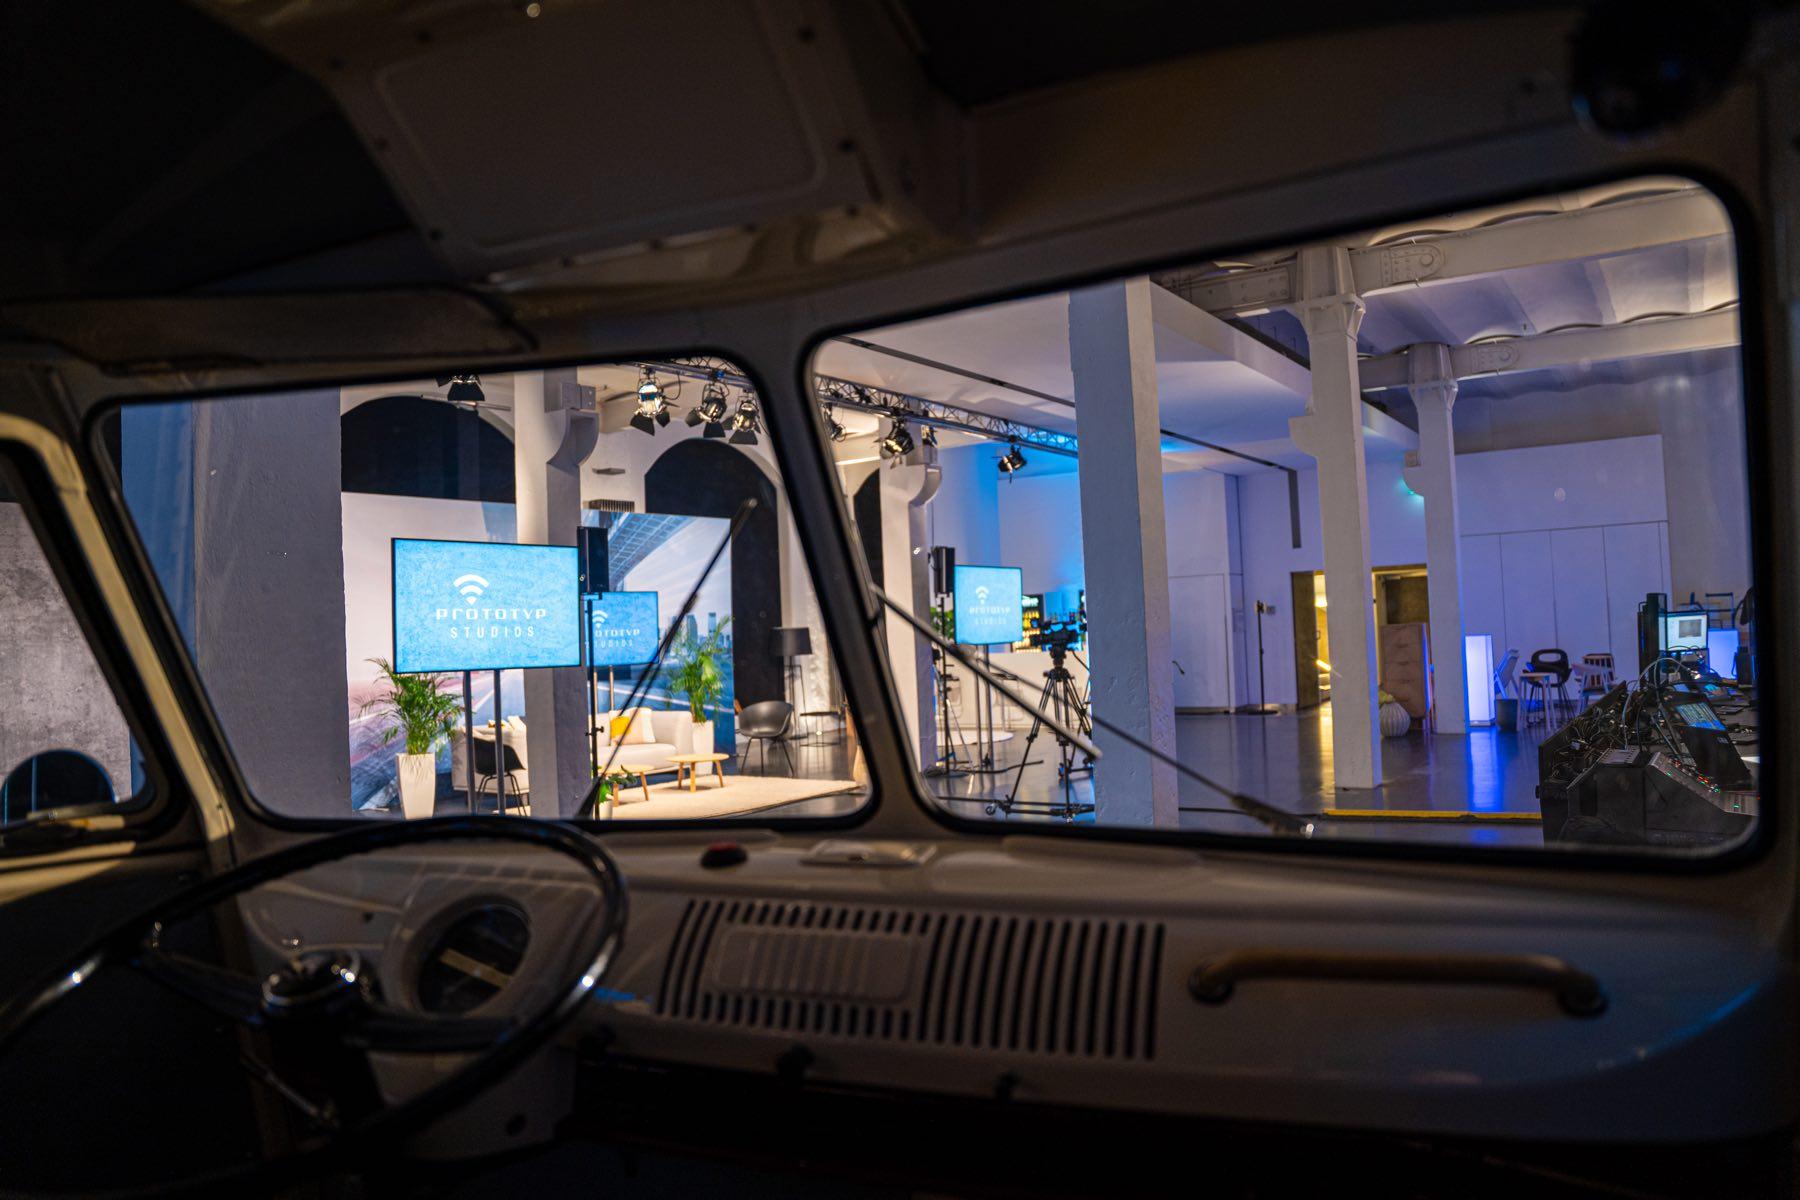 Peppermint Event eröffnet Studio in Hamburger Hafencity